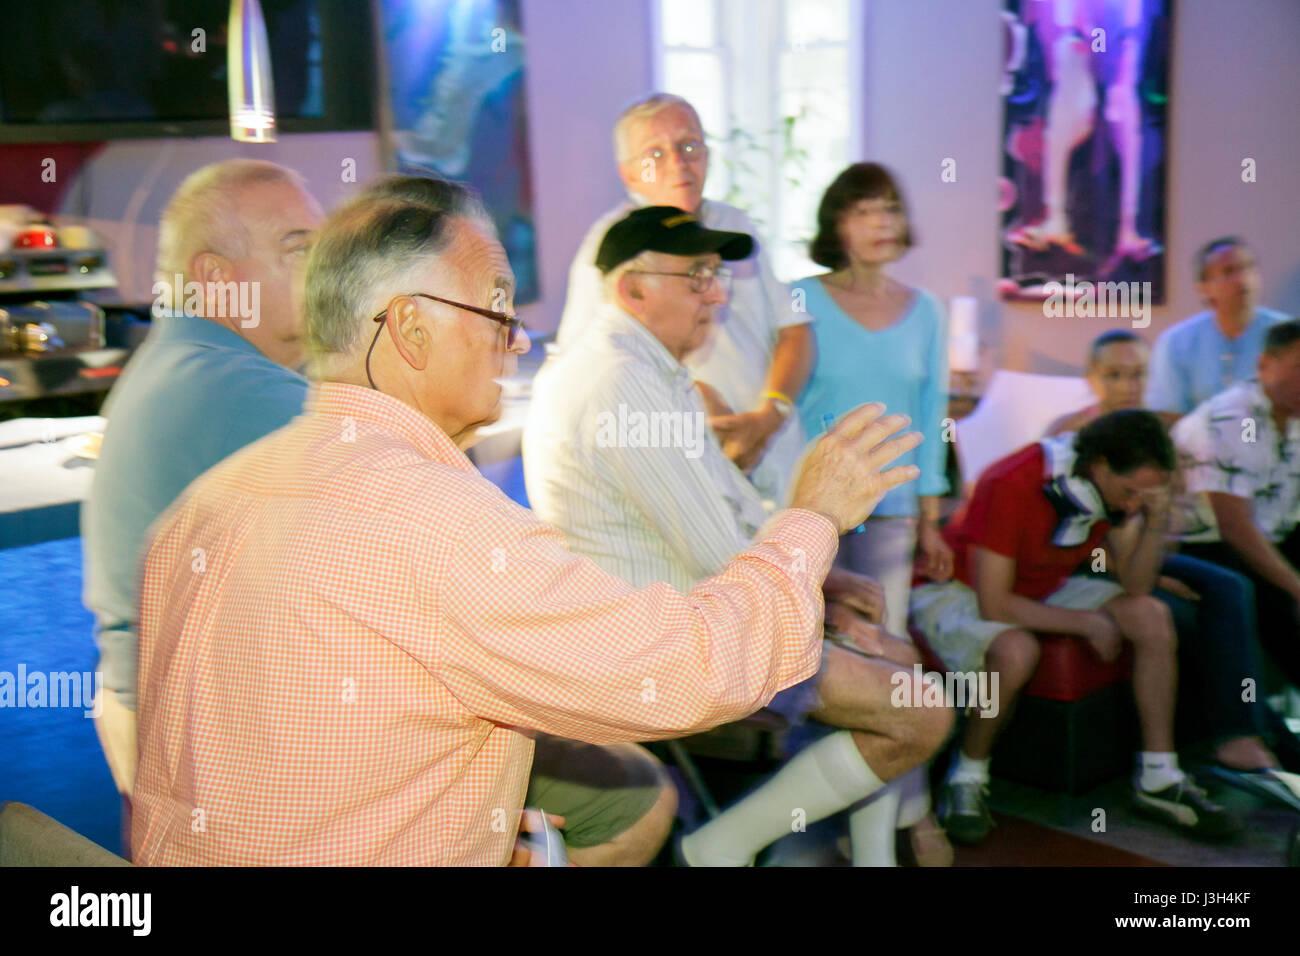 Miami Beach Florida Ocean Drive The Wave Hotel man men woman senior community meeting discussion speaks gestures - Stock Image